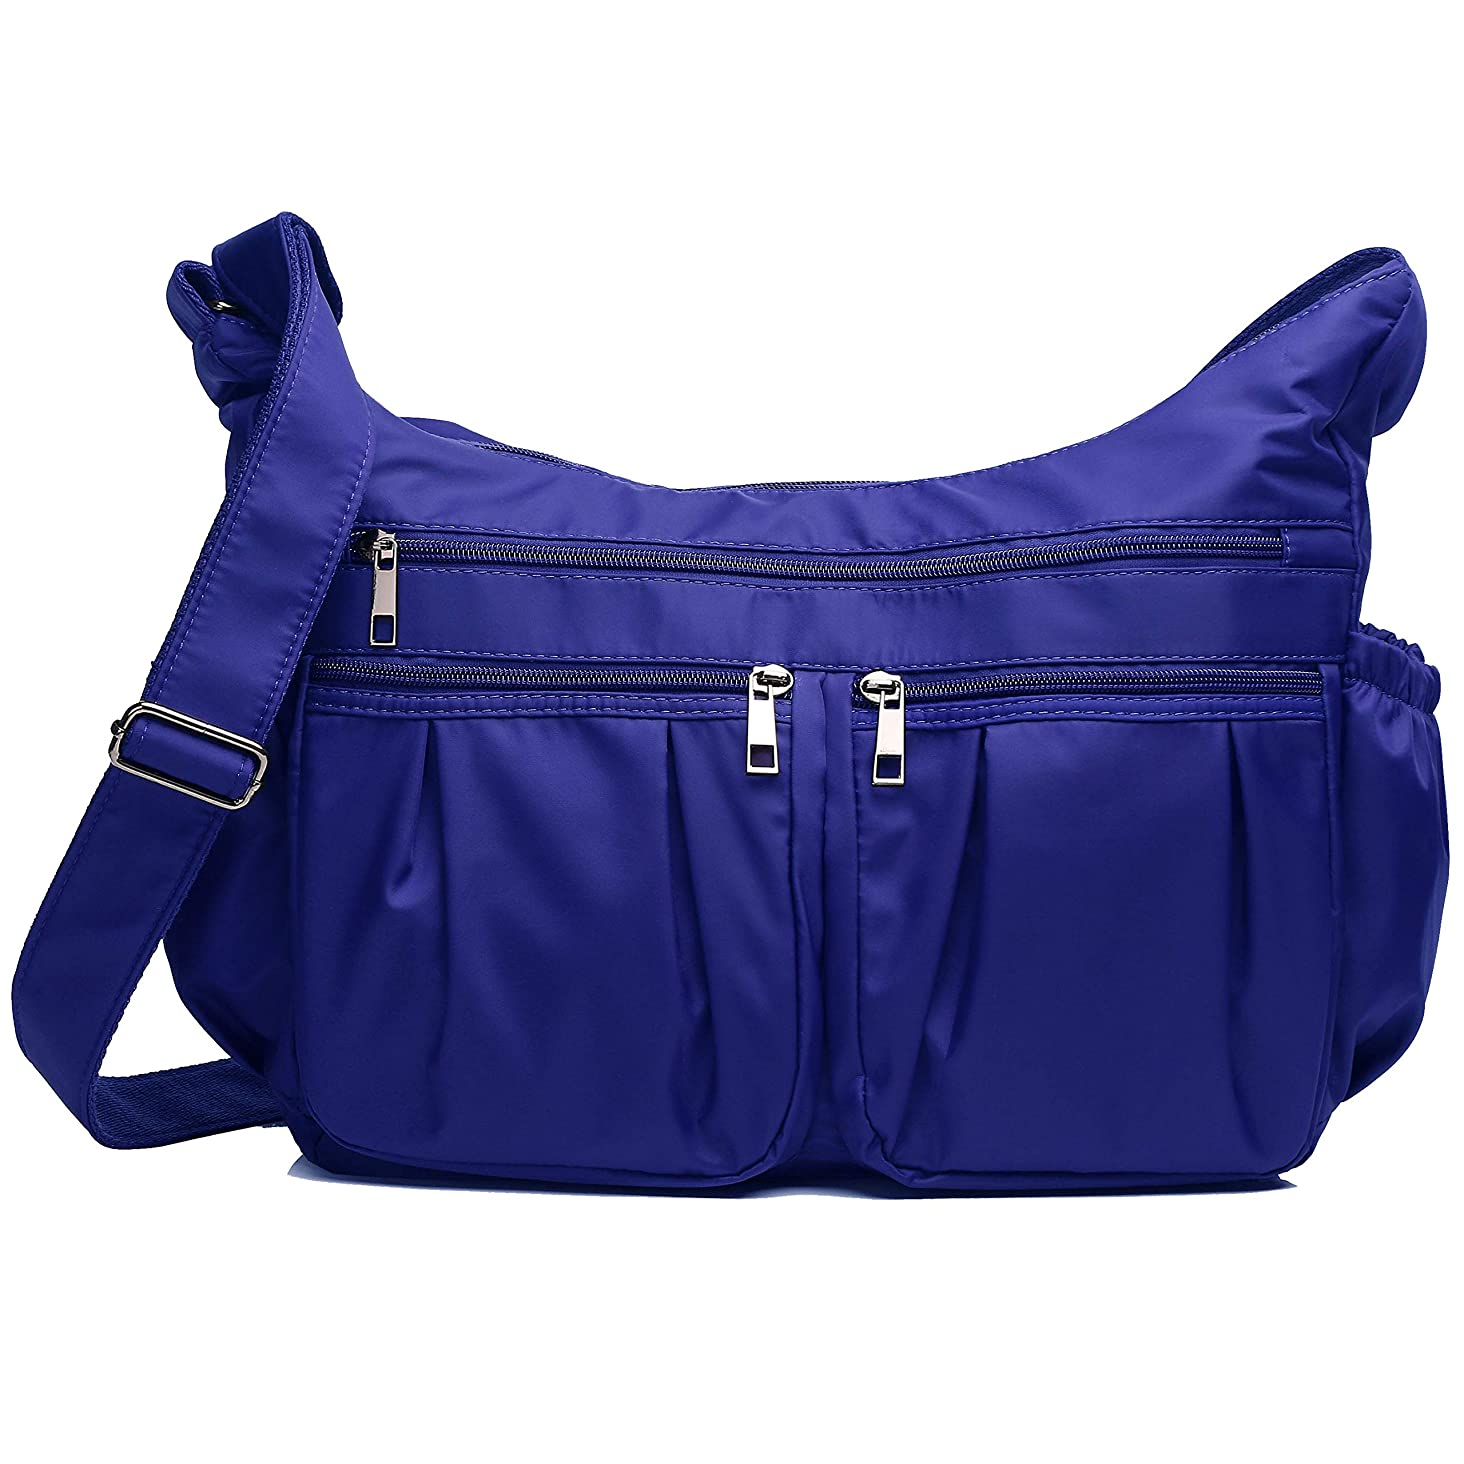 Crossbody Bags for Women, Multi Pocket Shoulder Bag Waterproof Nylon Travel Purses and Handbags